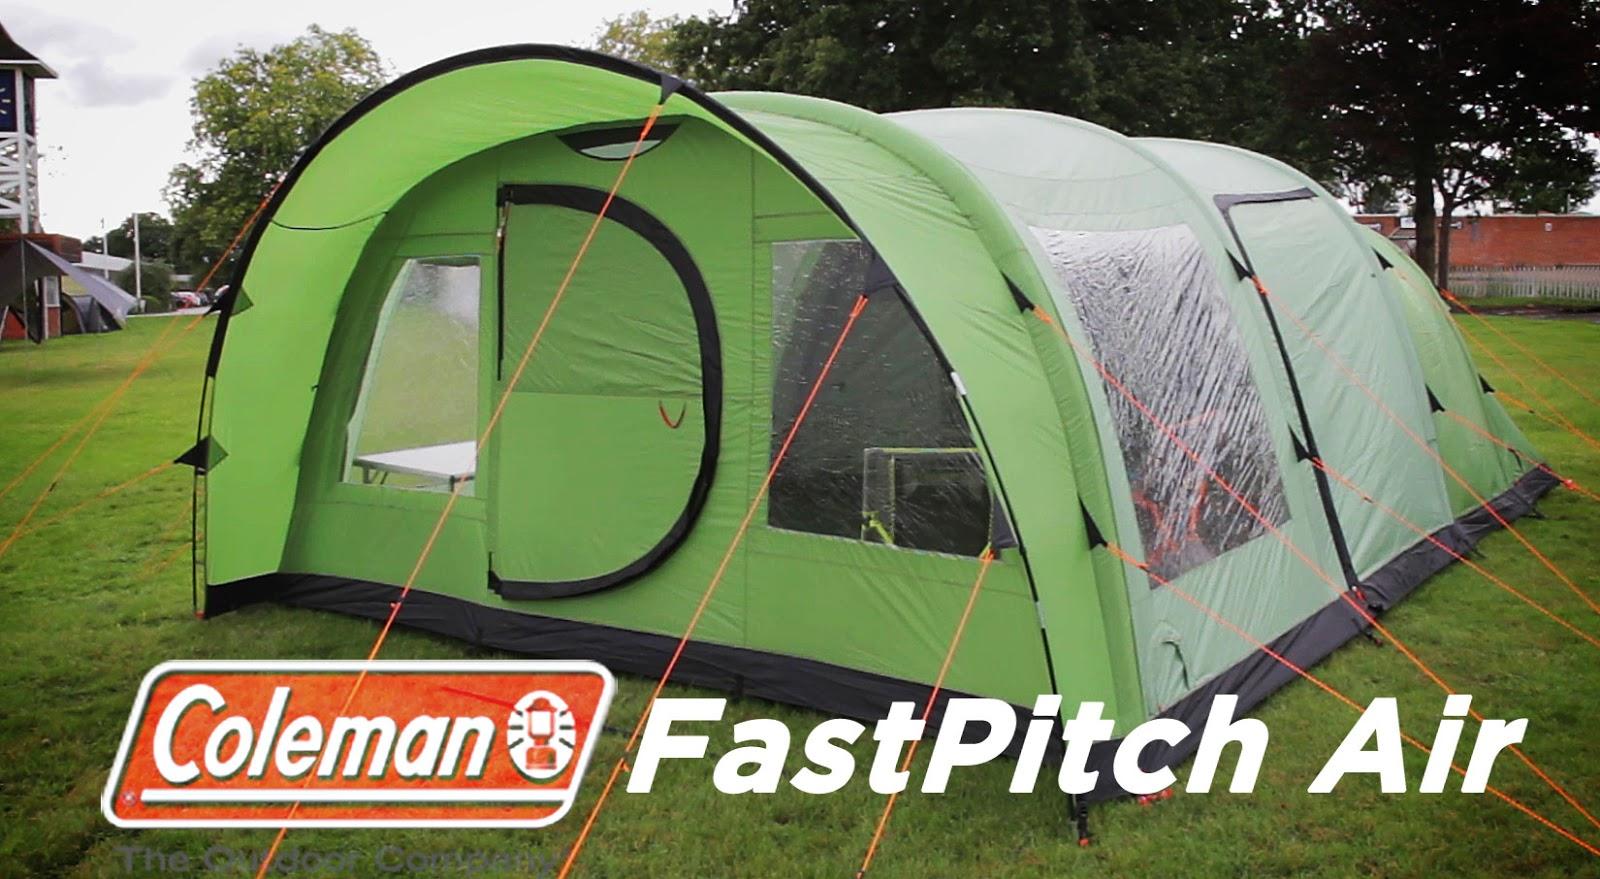 FastPitch Air - The Valdes Range & Three Zero Blog: Coleman FastPitch Air Tents